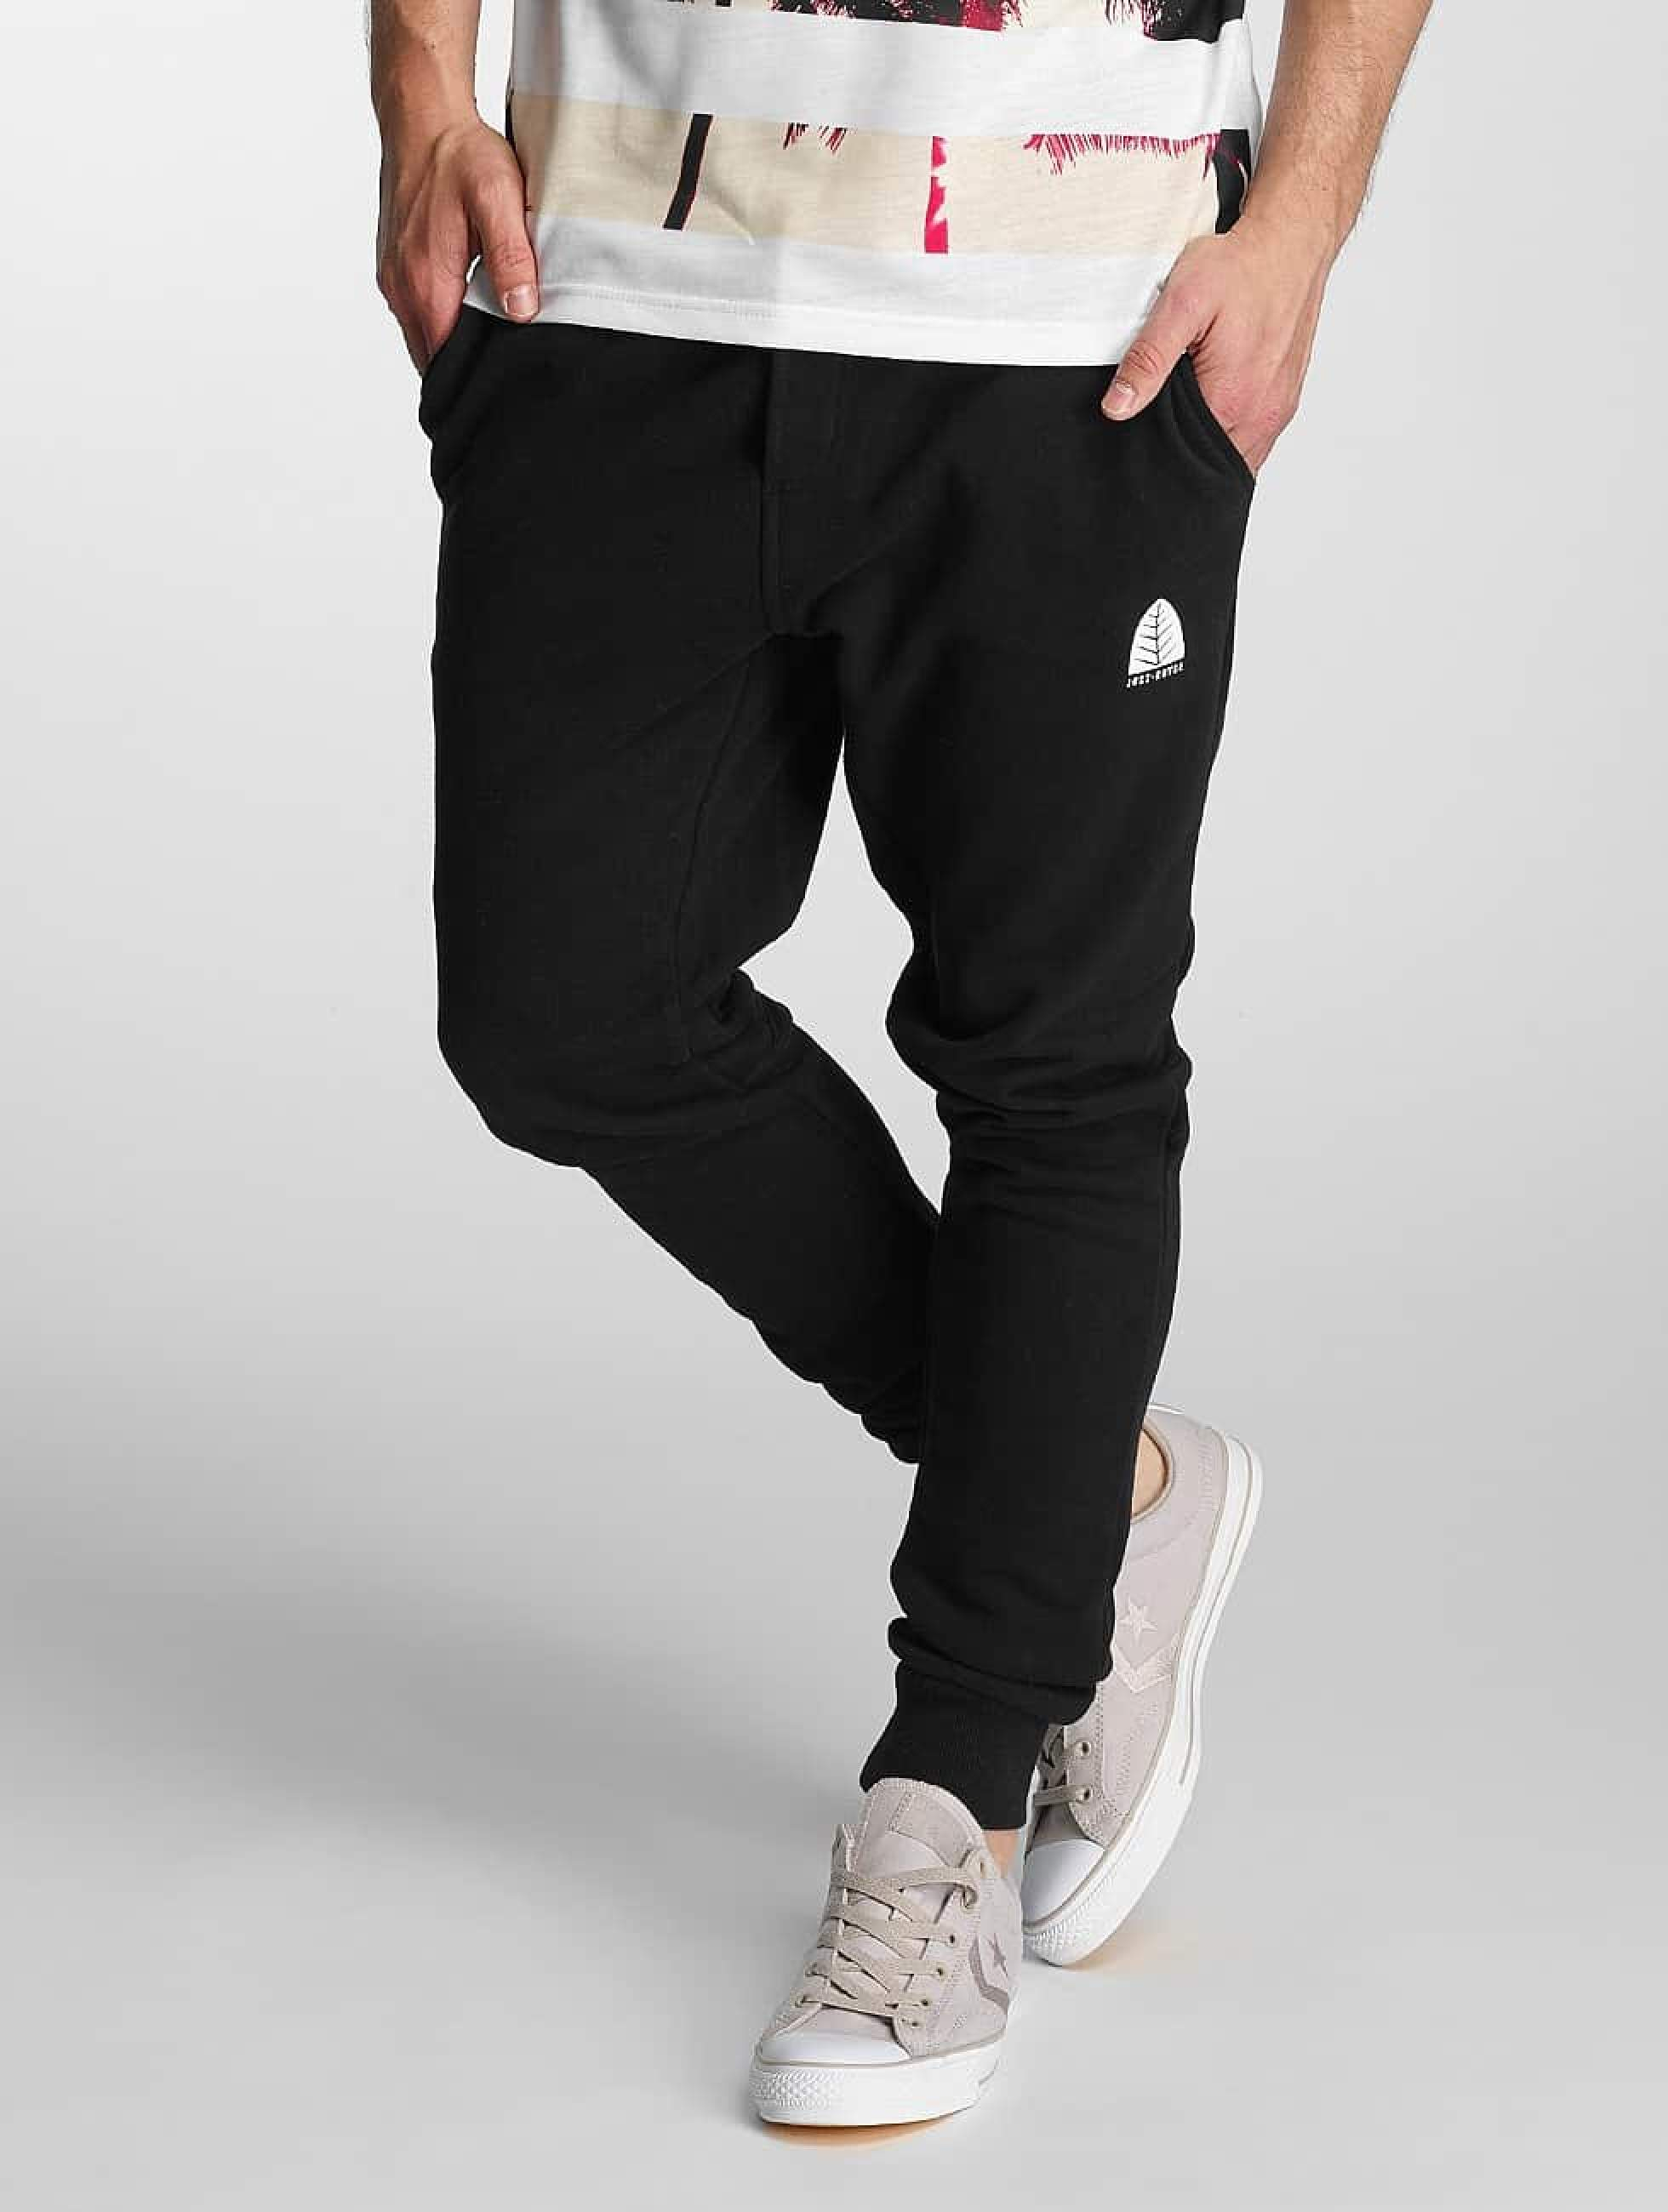 Just Rhyse / Sweat Pant Baseline in black 2XL